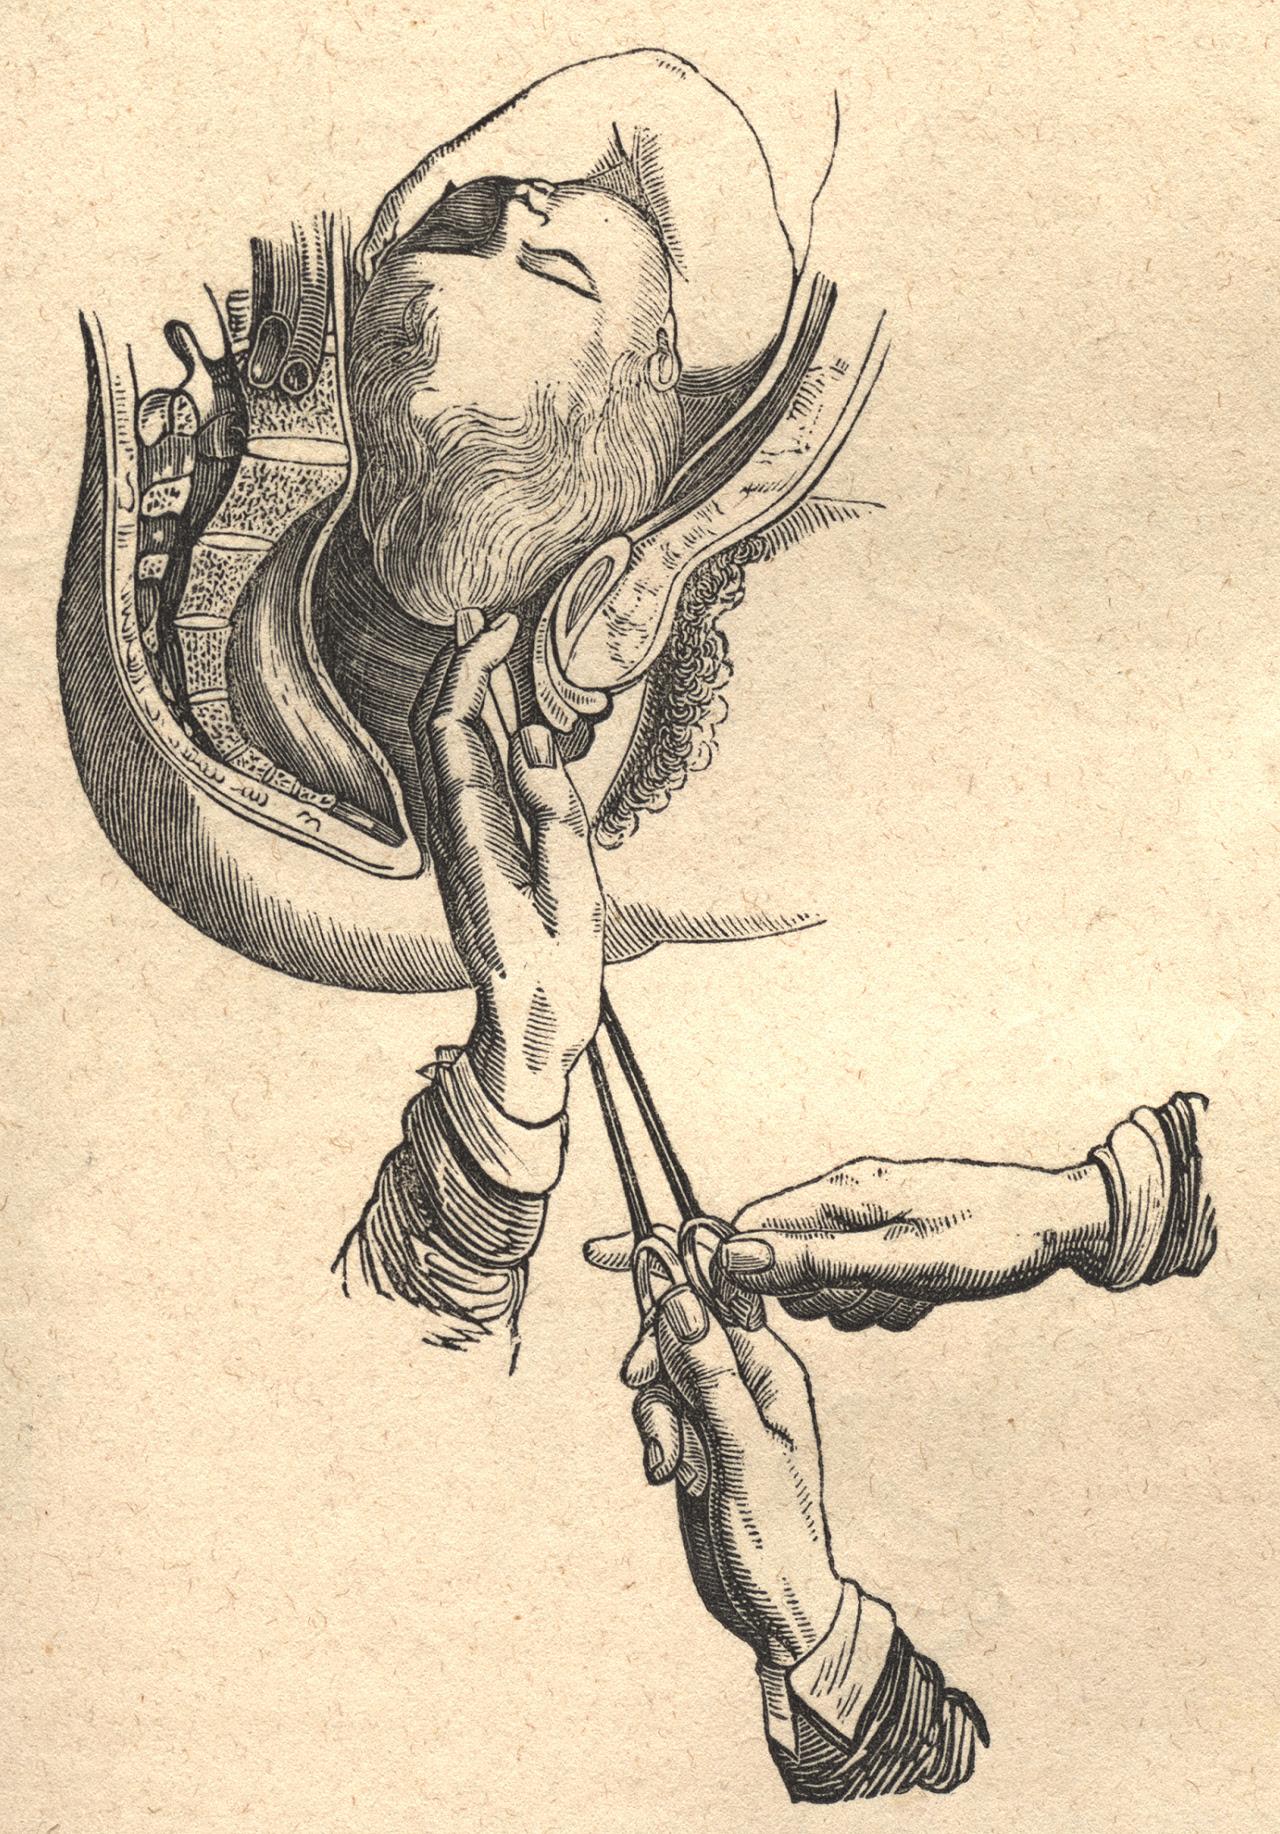 http://www.nlm.nih.gov/exhibition/cesarean/images/craniotomy.jpg